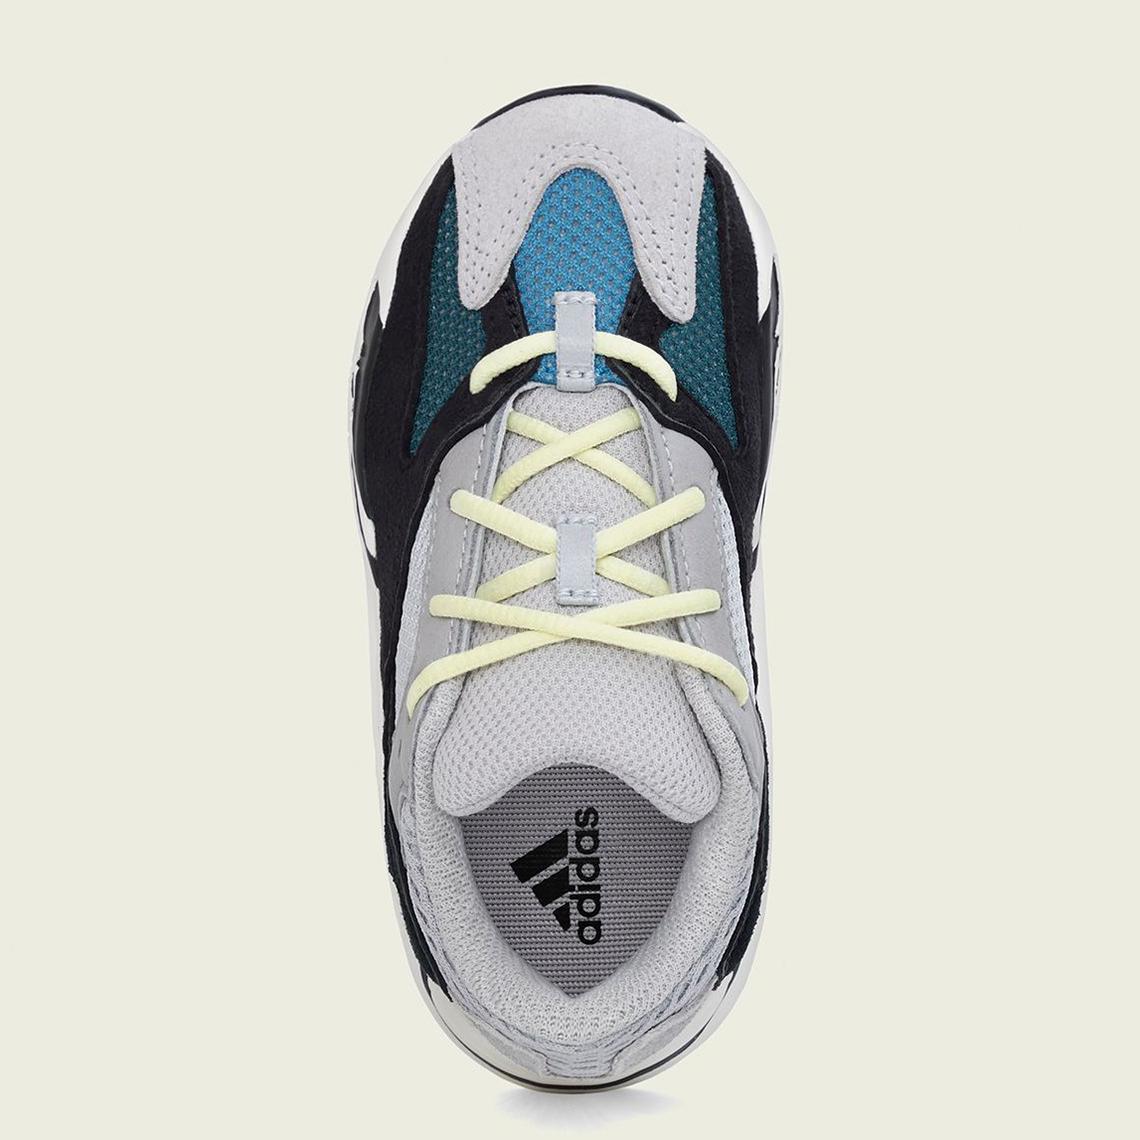 huge selection of 7b8a2 e5188 adidas Yeezy 700 Waverunner 2019 Release Date | SneakerNews.com